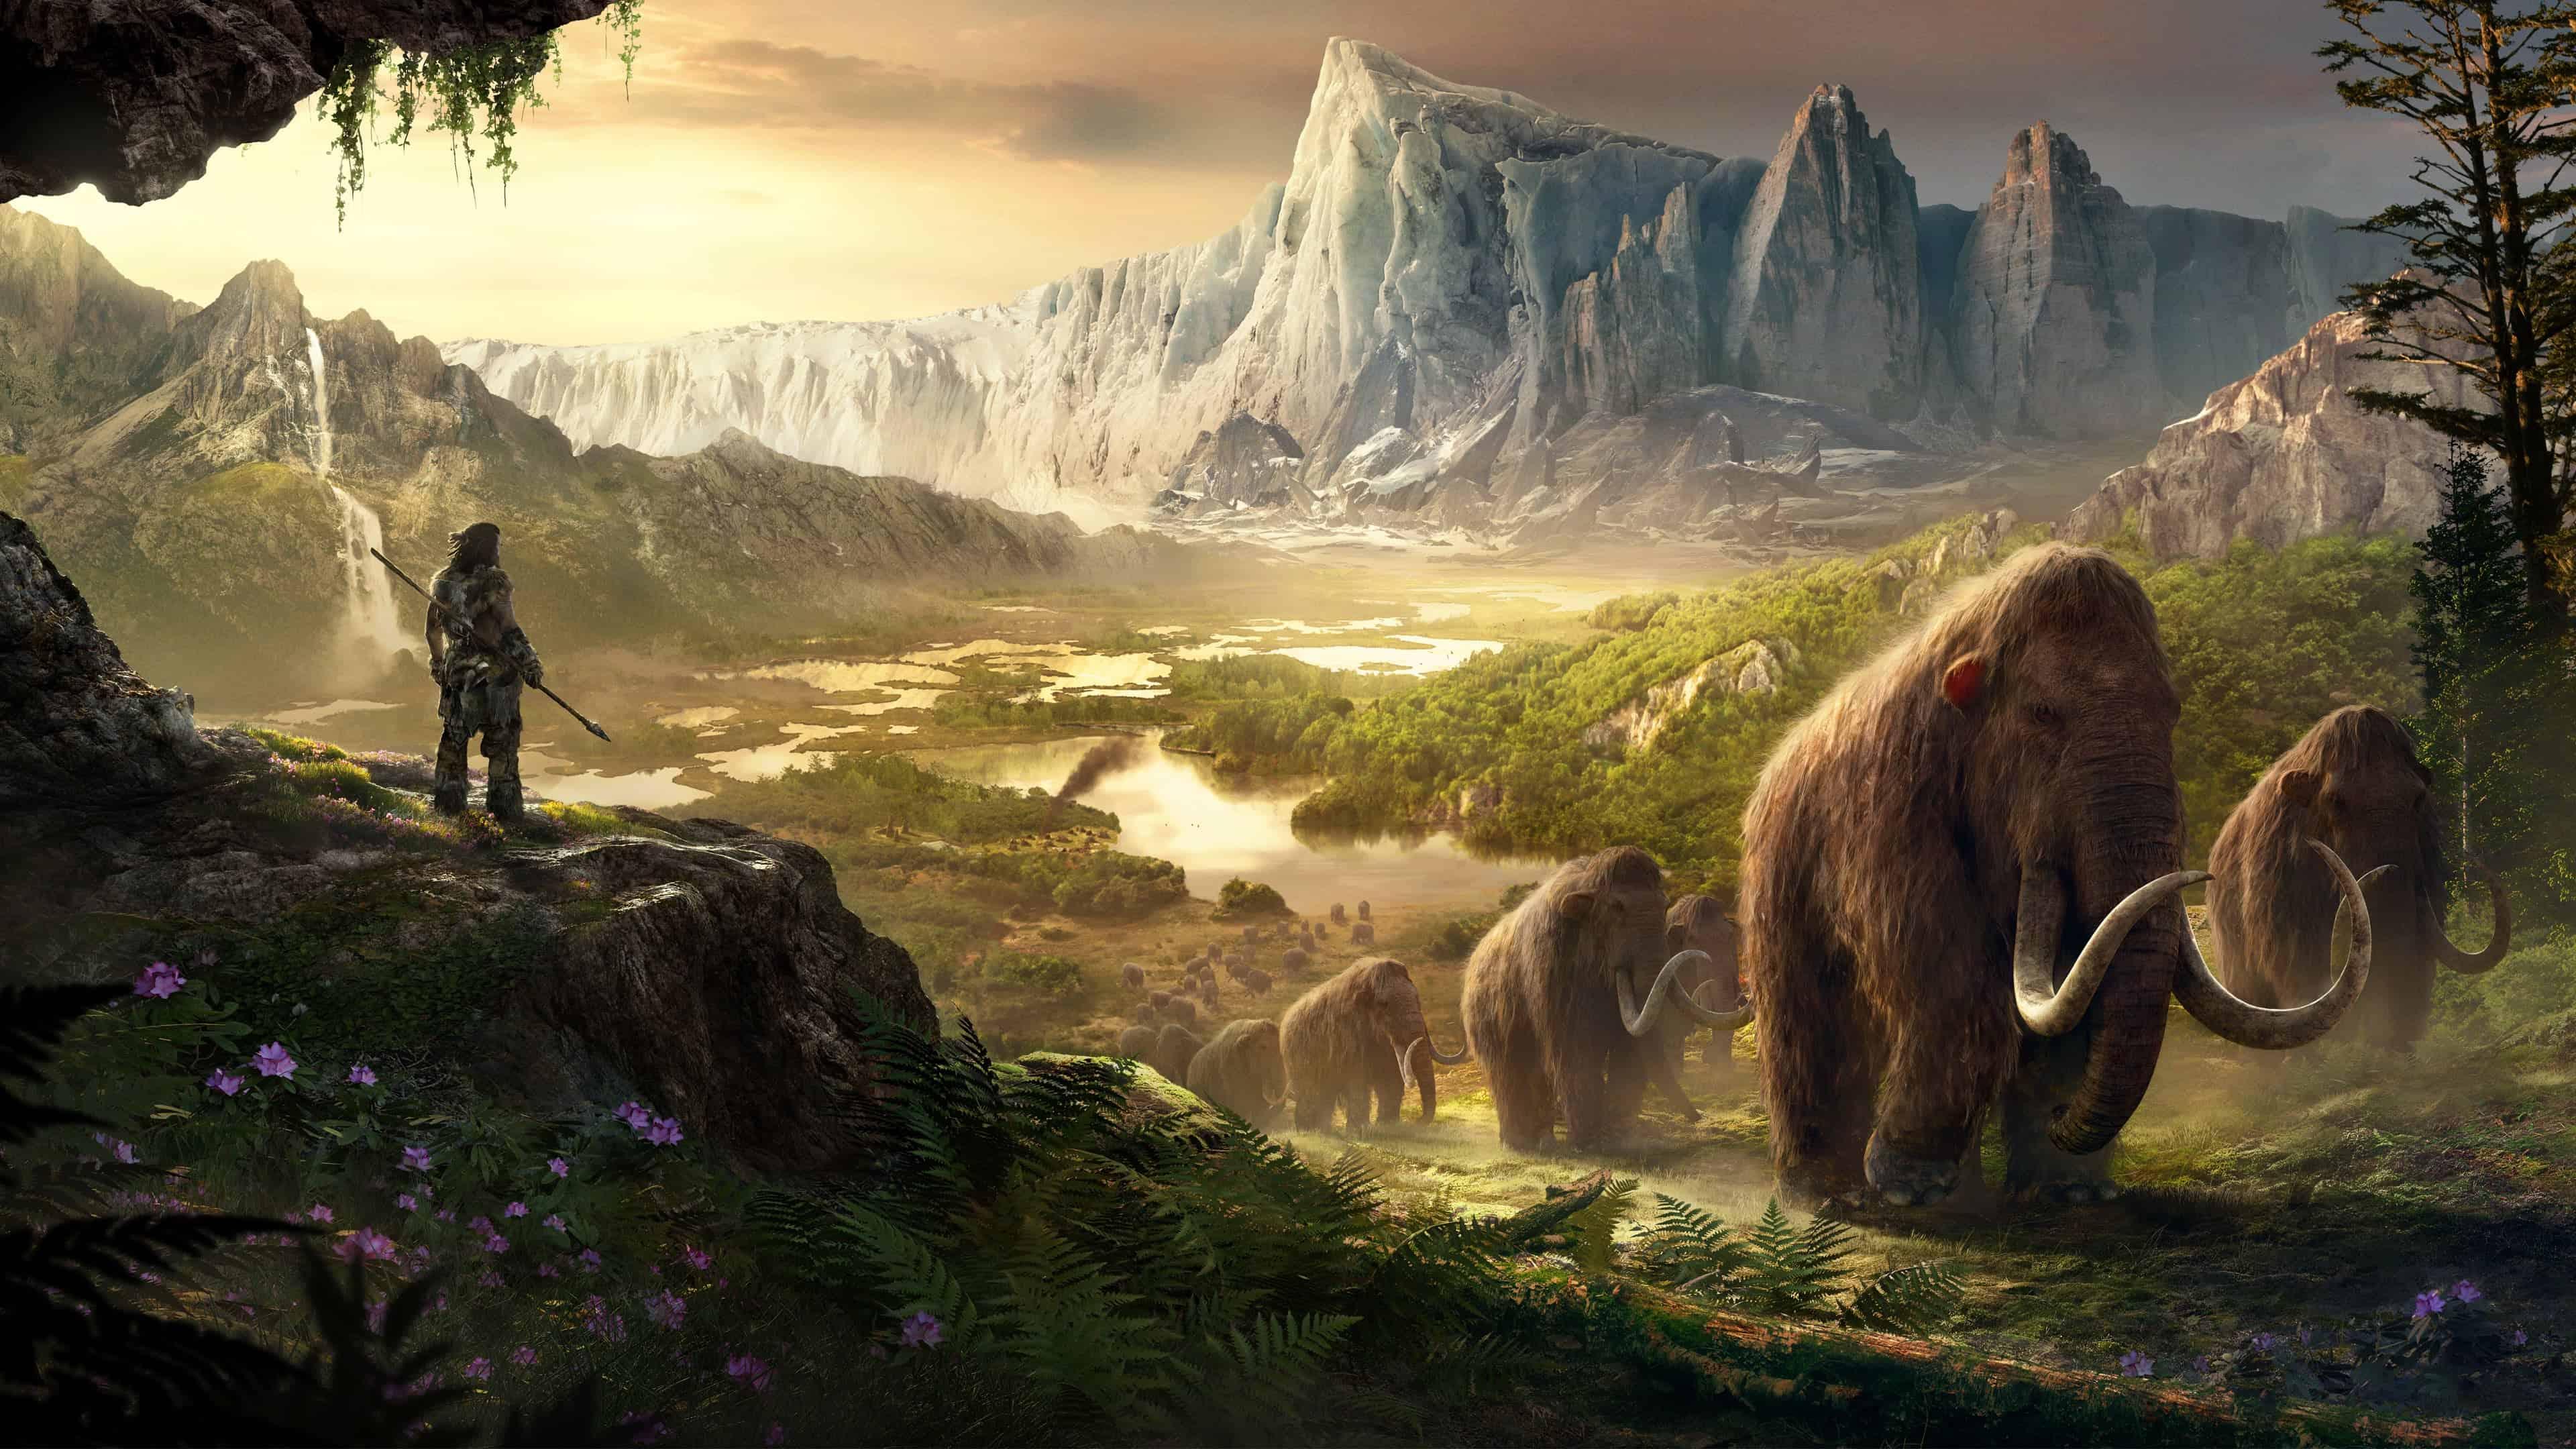 Far Cry Primal Mammoths UHD 4K Wallpaper | Pixelz